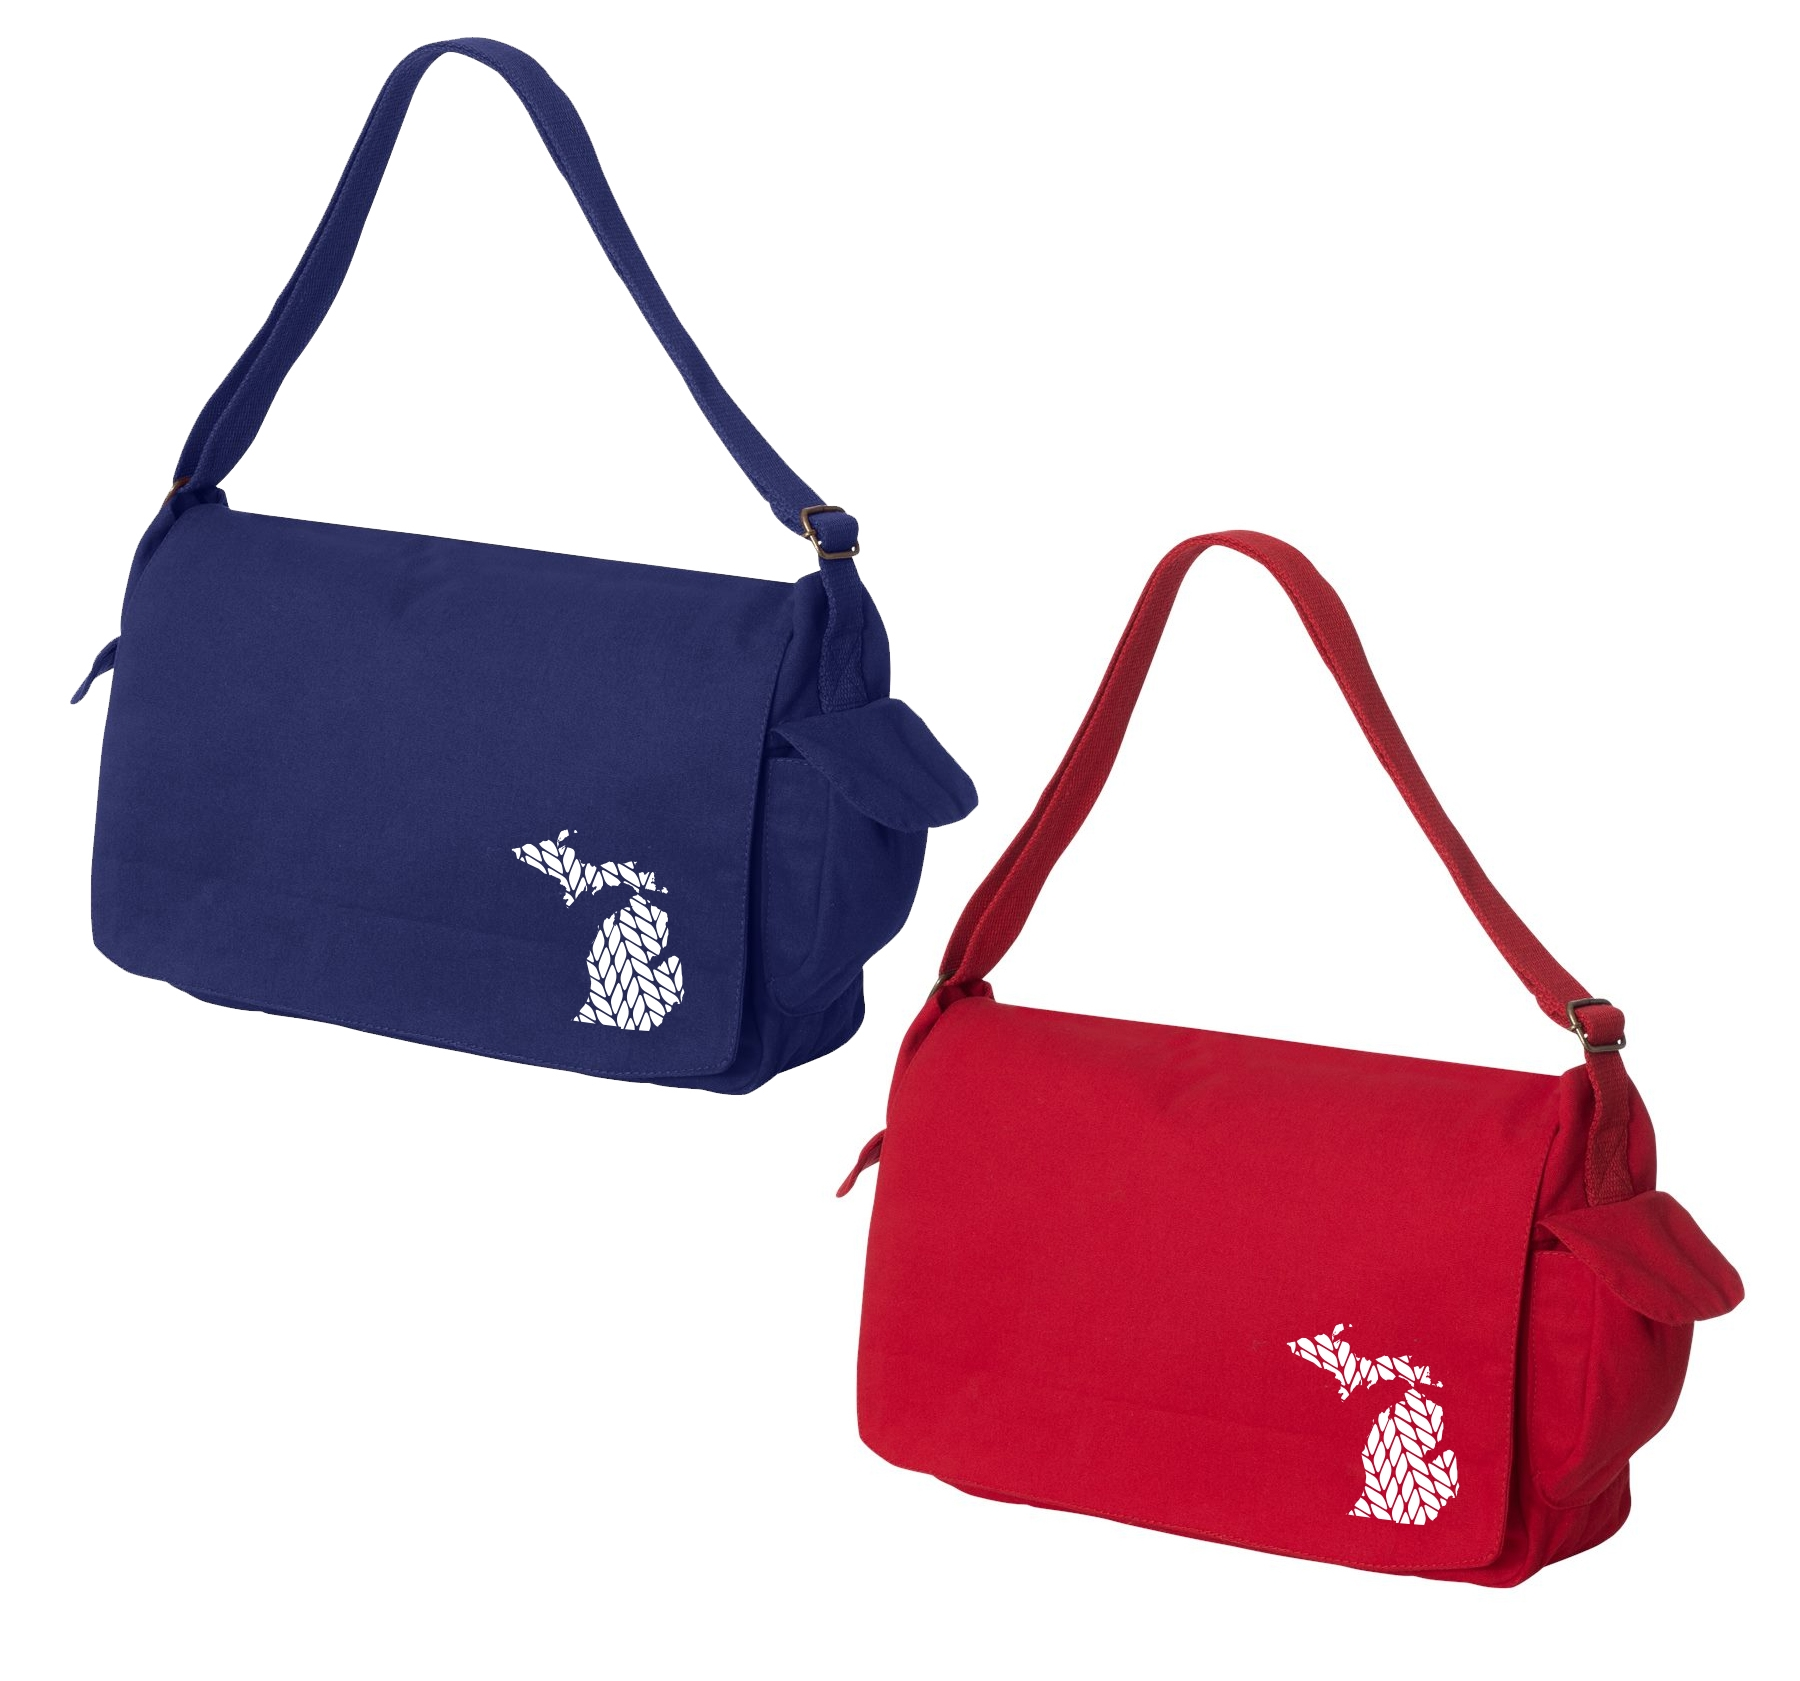 Michigan Messenger Bag, Explore Michigan, Pure Michigan, Love Michigan, Mitten Love, Home in the Mitten